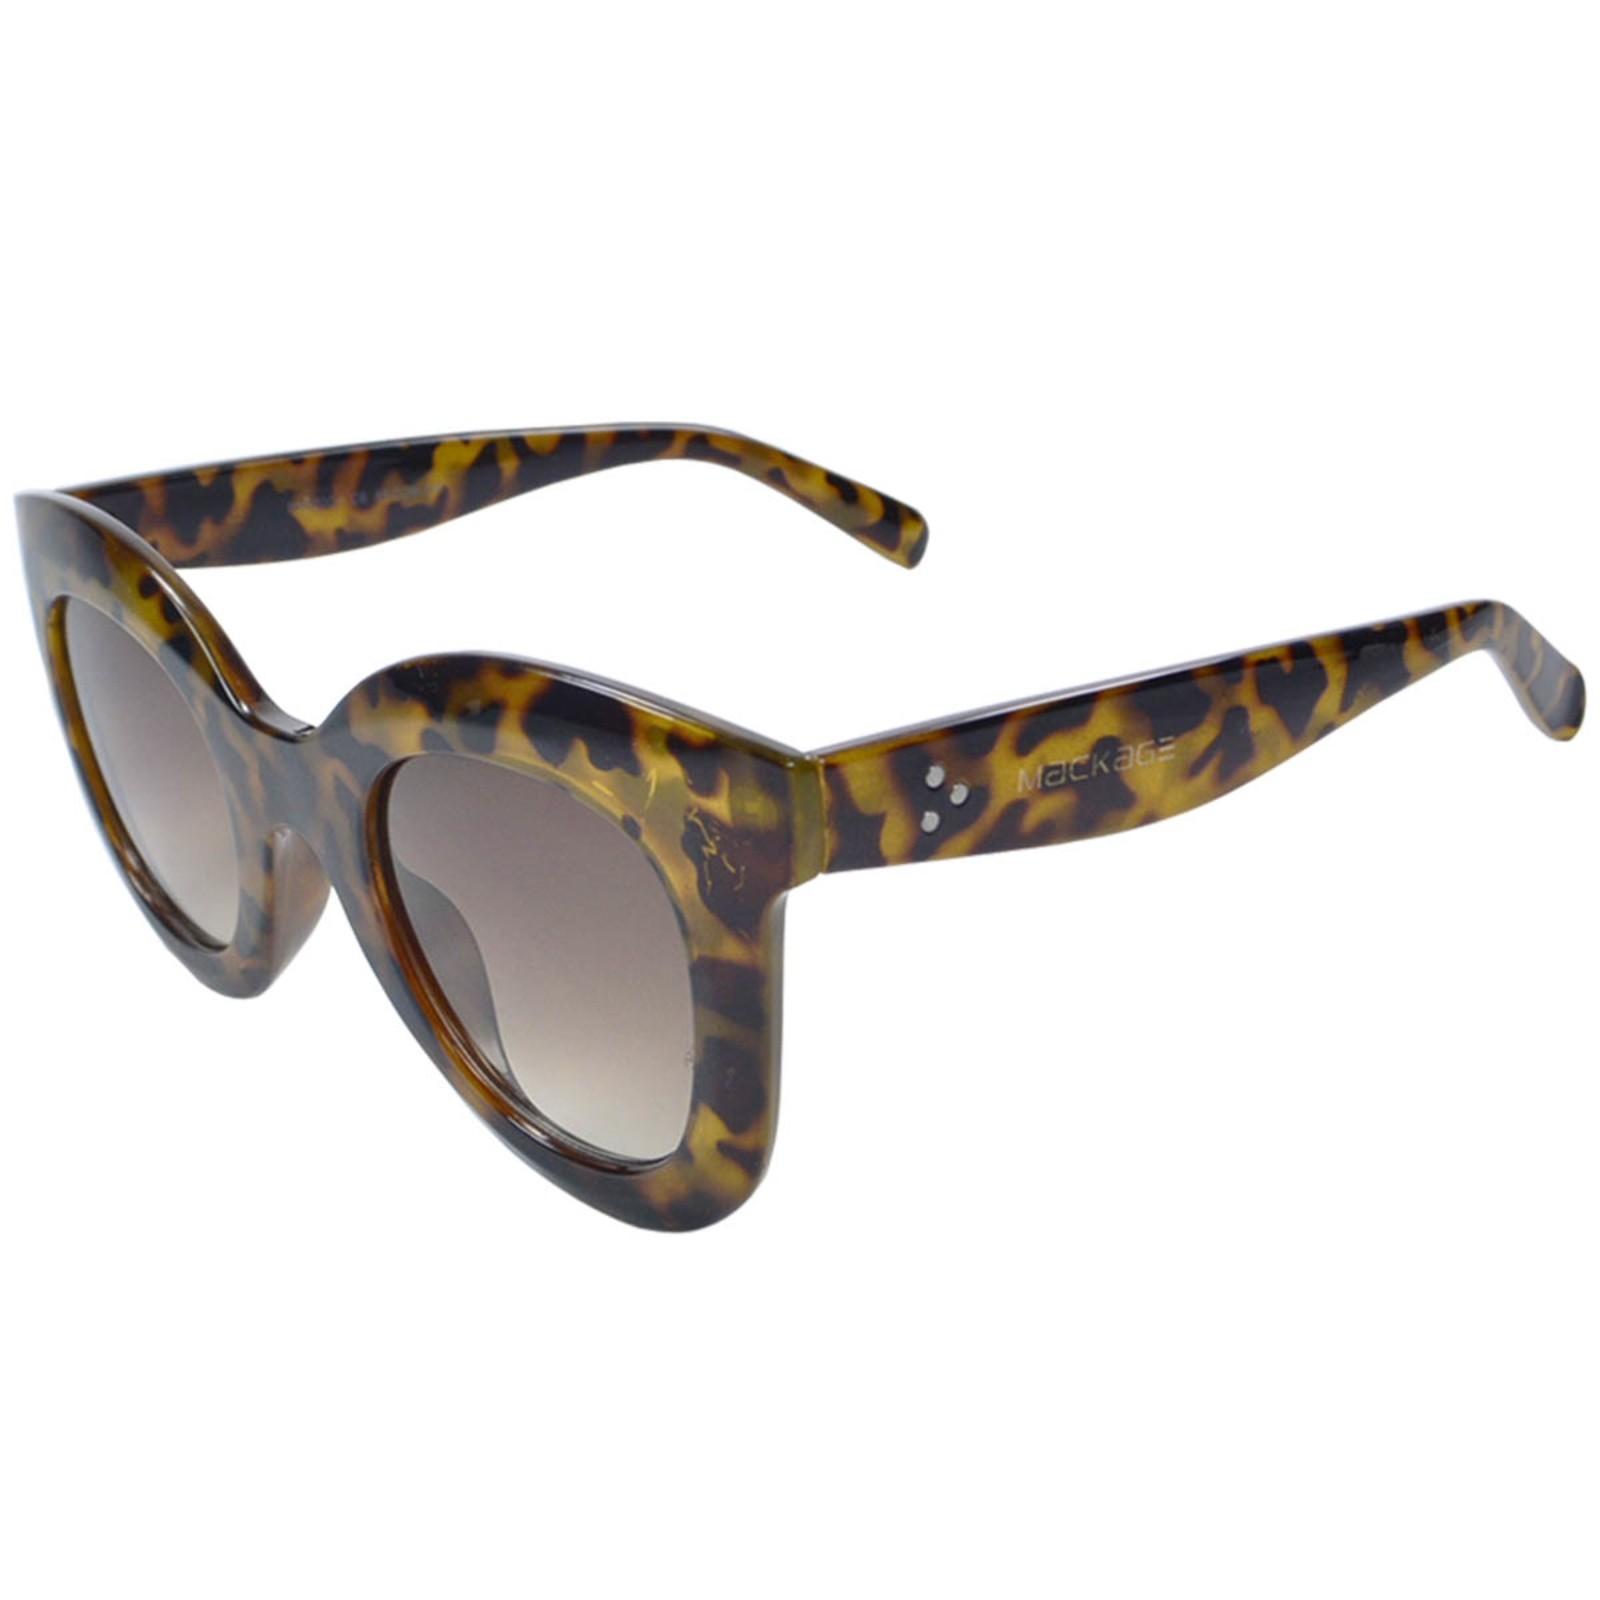 Óculos De Sol Mackage Acetato Feminino Oversize Redondo Retrô - Tarta